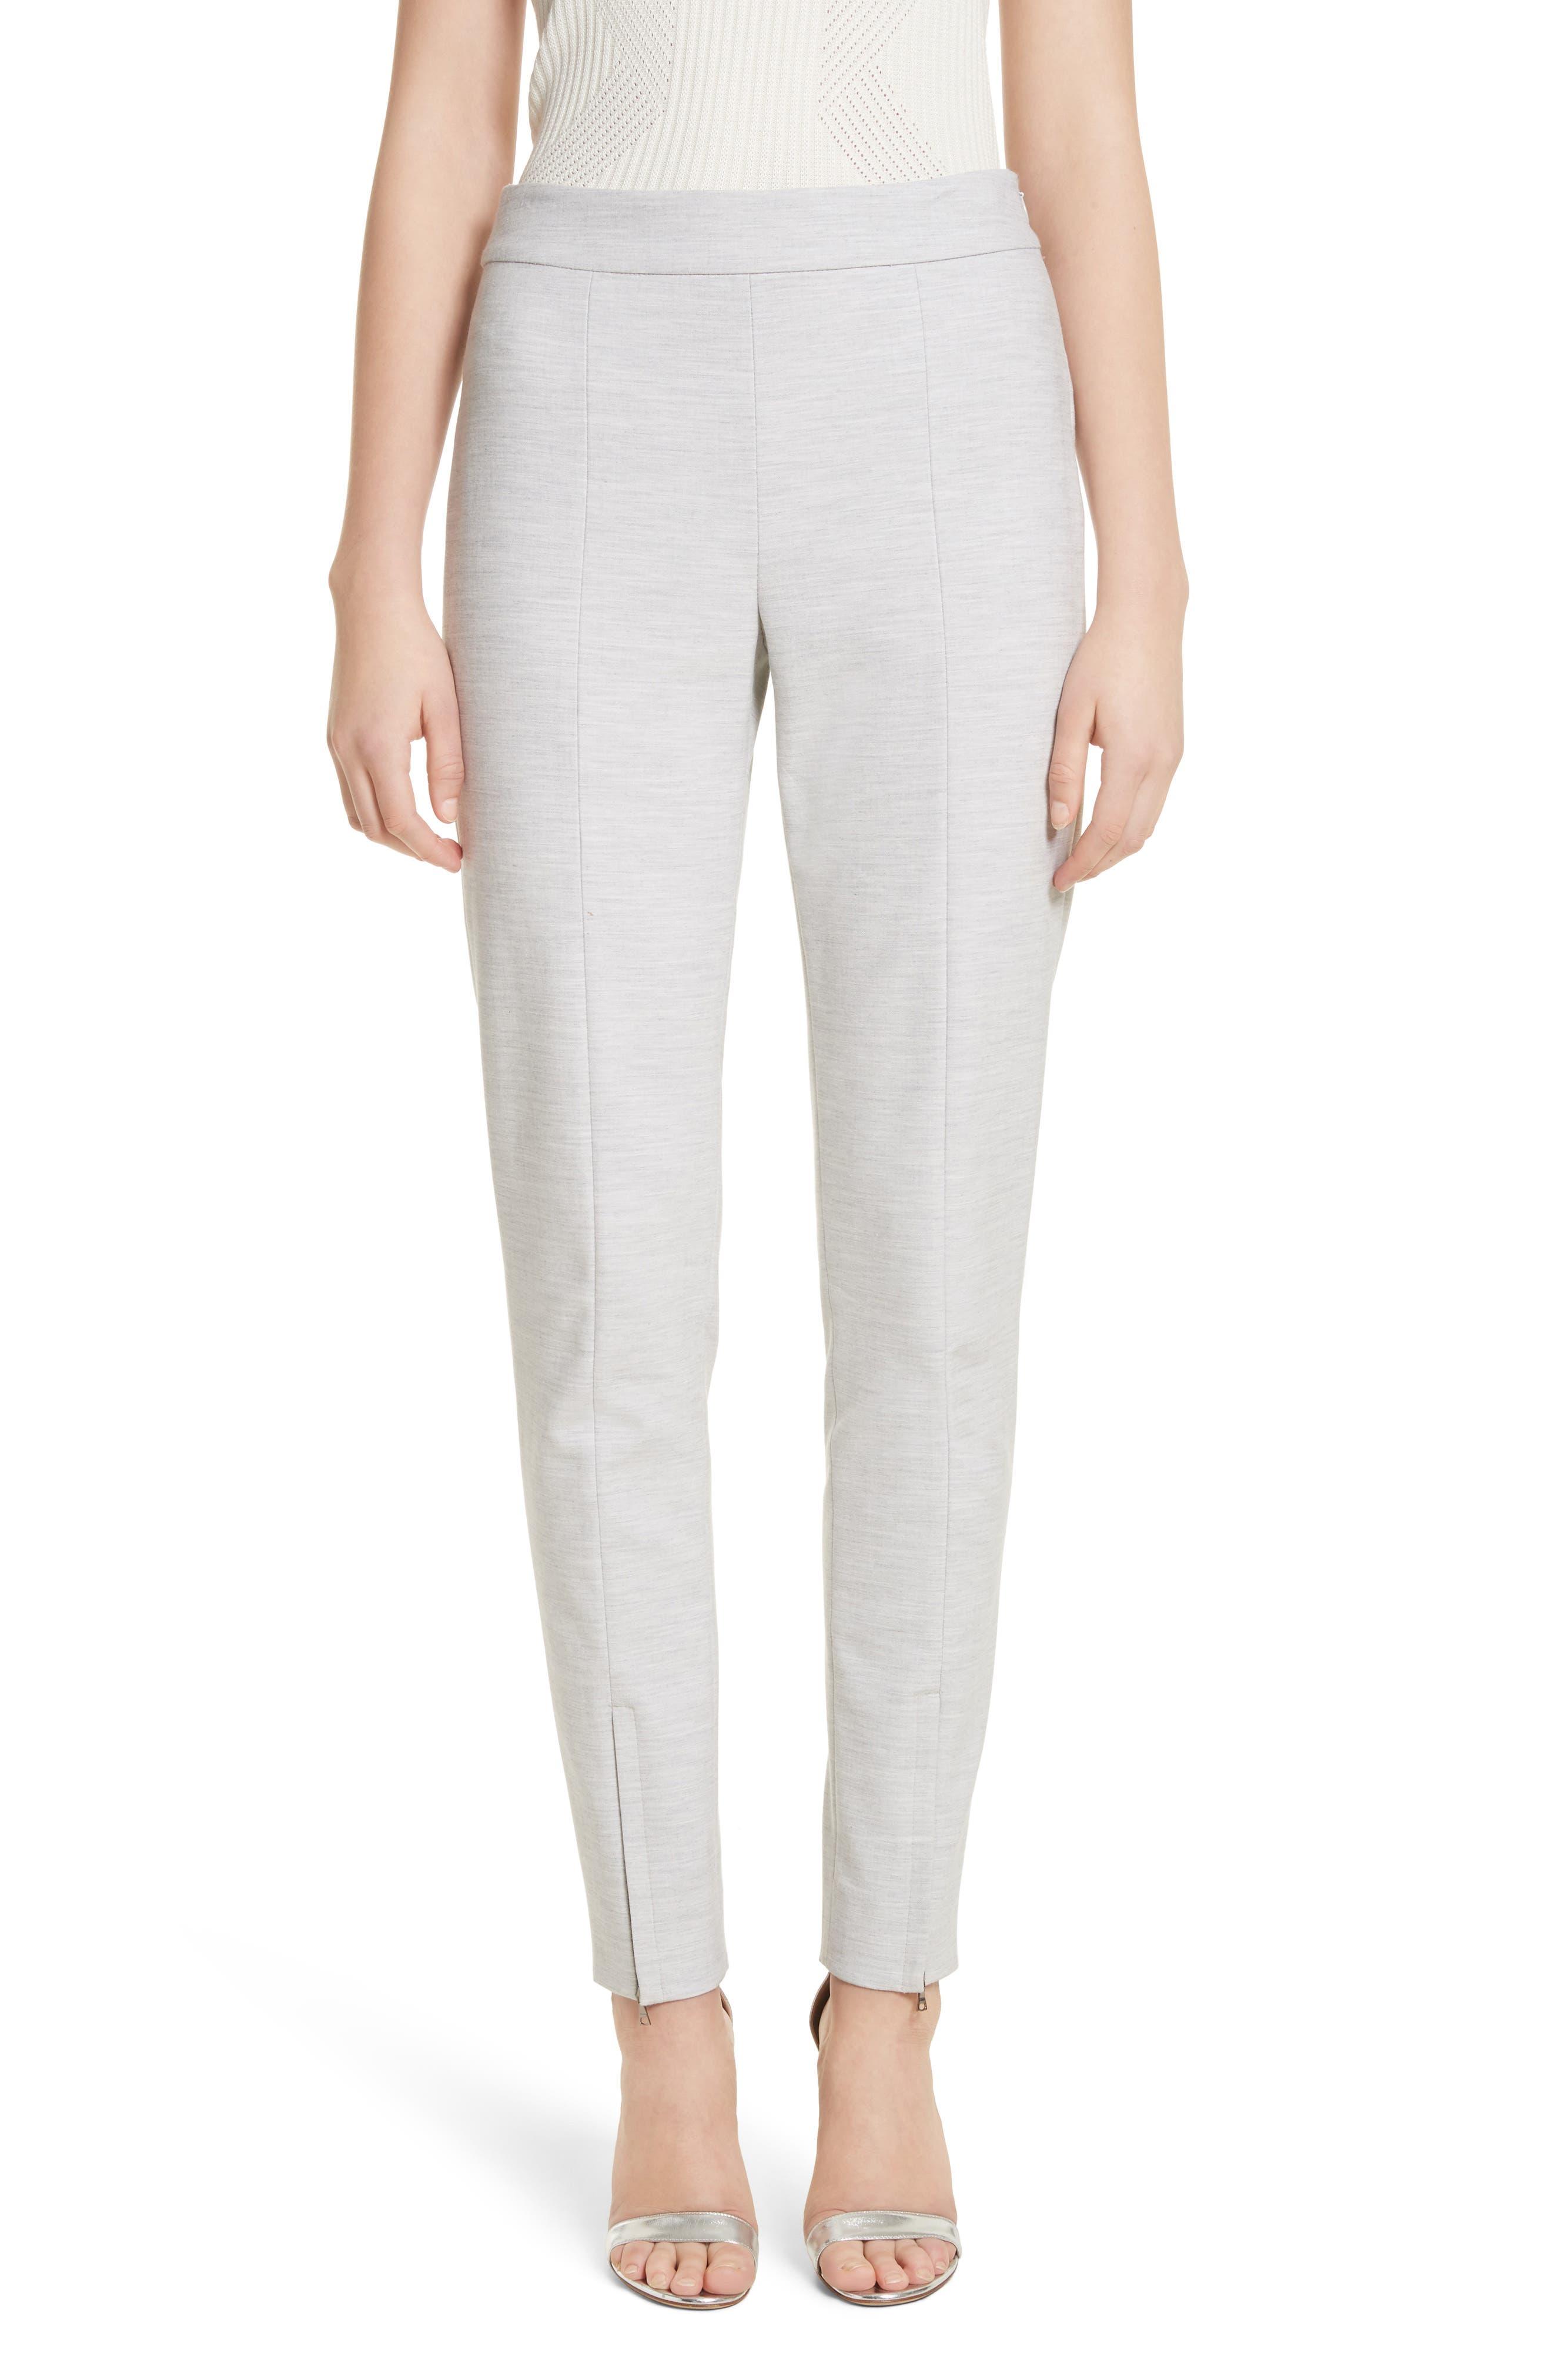 Summer Bella Double Weave Pants,                             Main thumbnail 1, color,                             Light Grey Melange